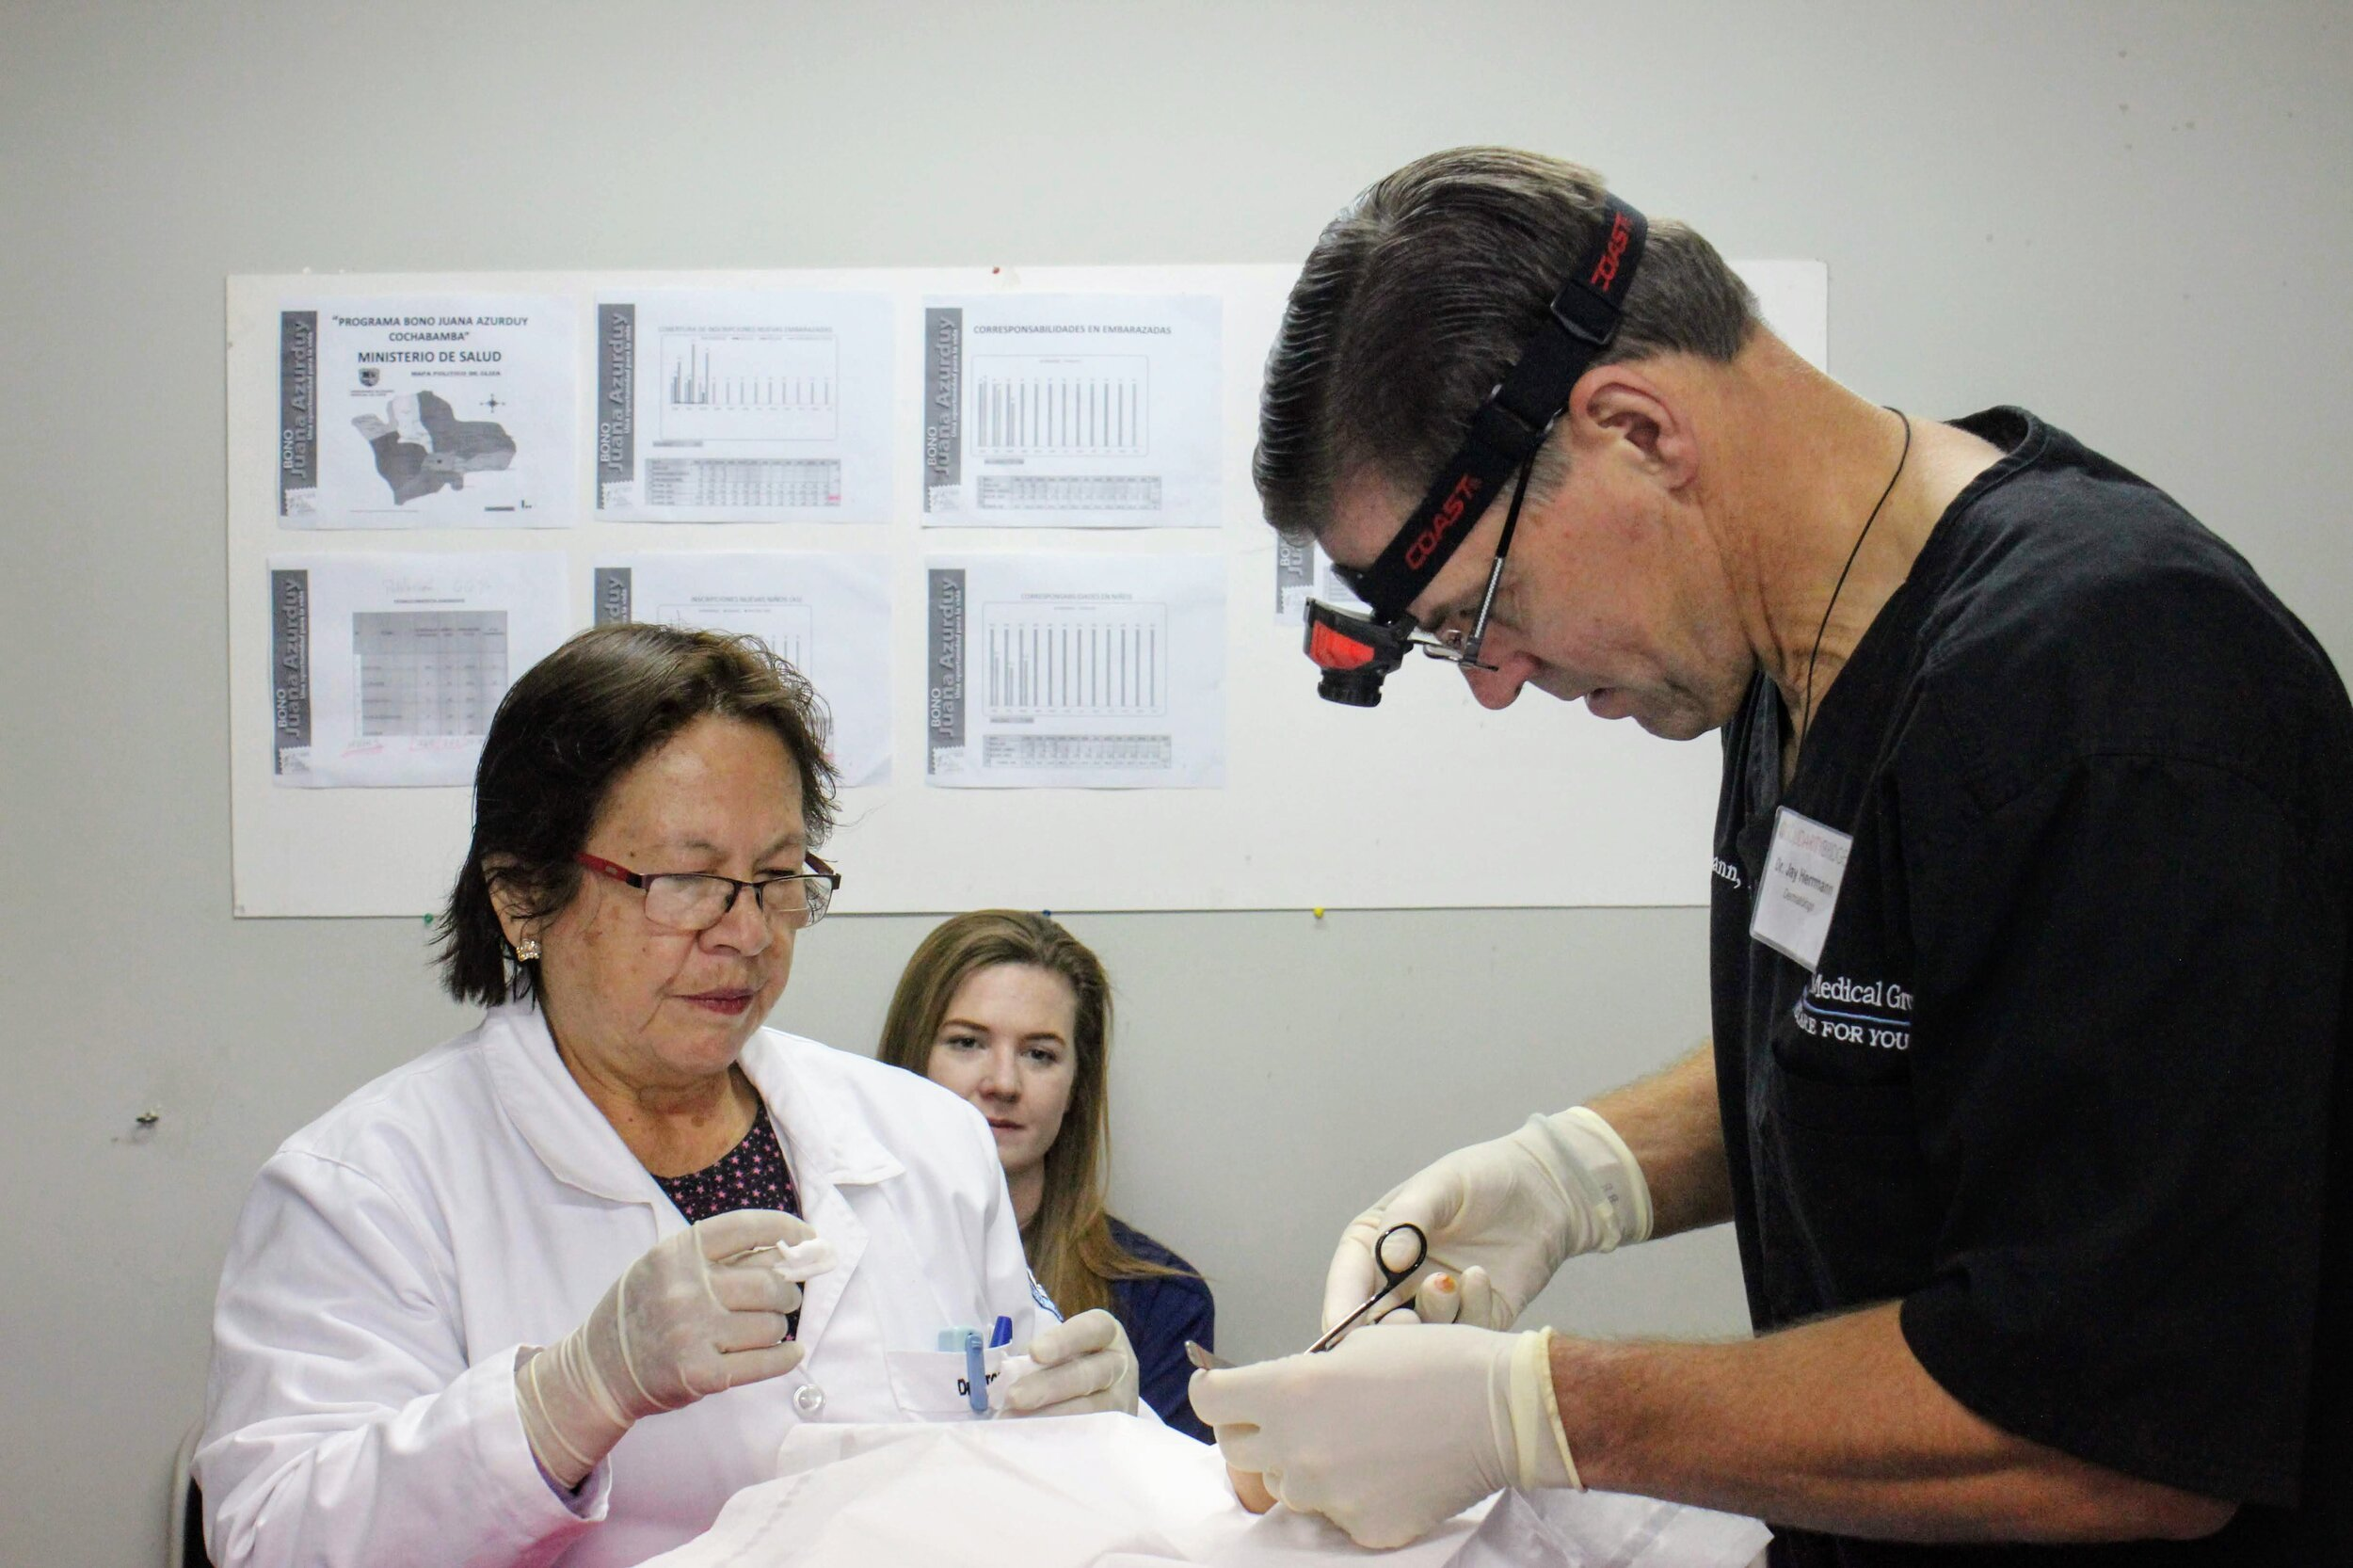 Dr. Torrico assists during a dermotology procedure